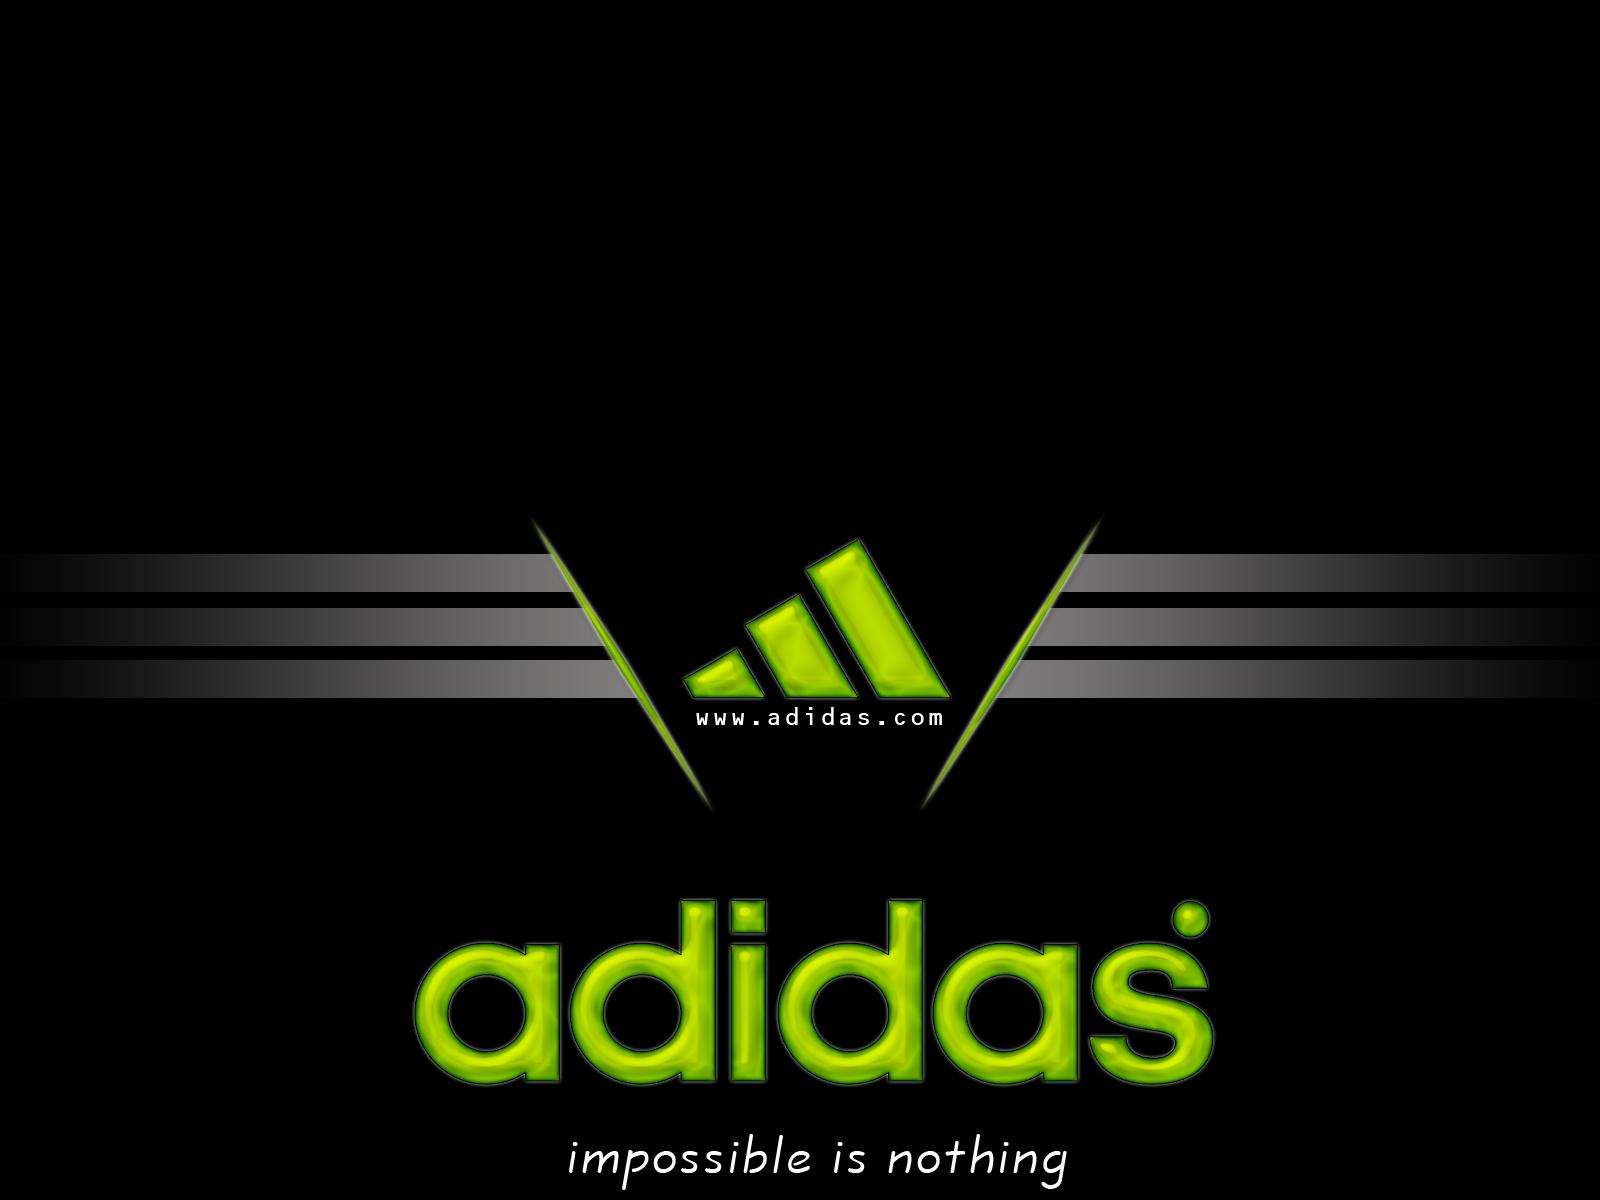 Adidas Logo Wallpapers 2015 1600x1200